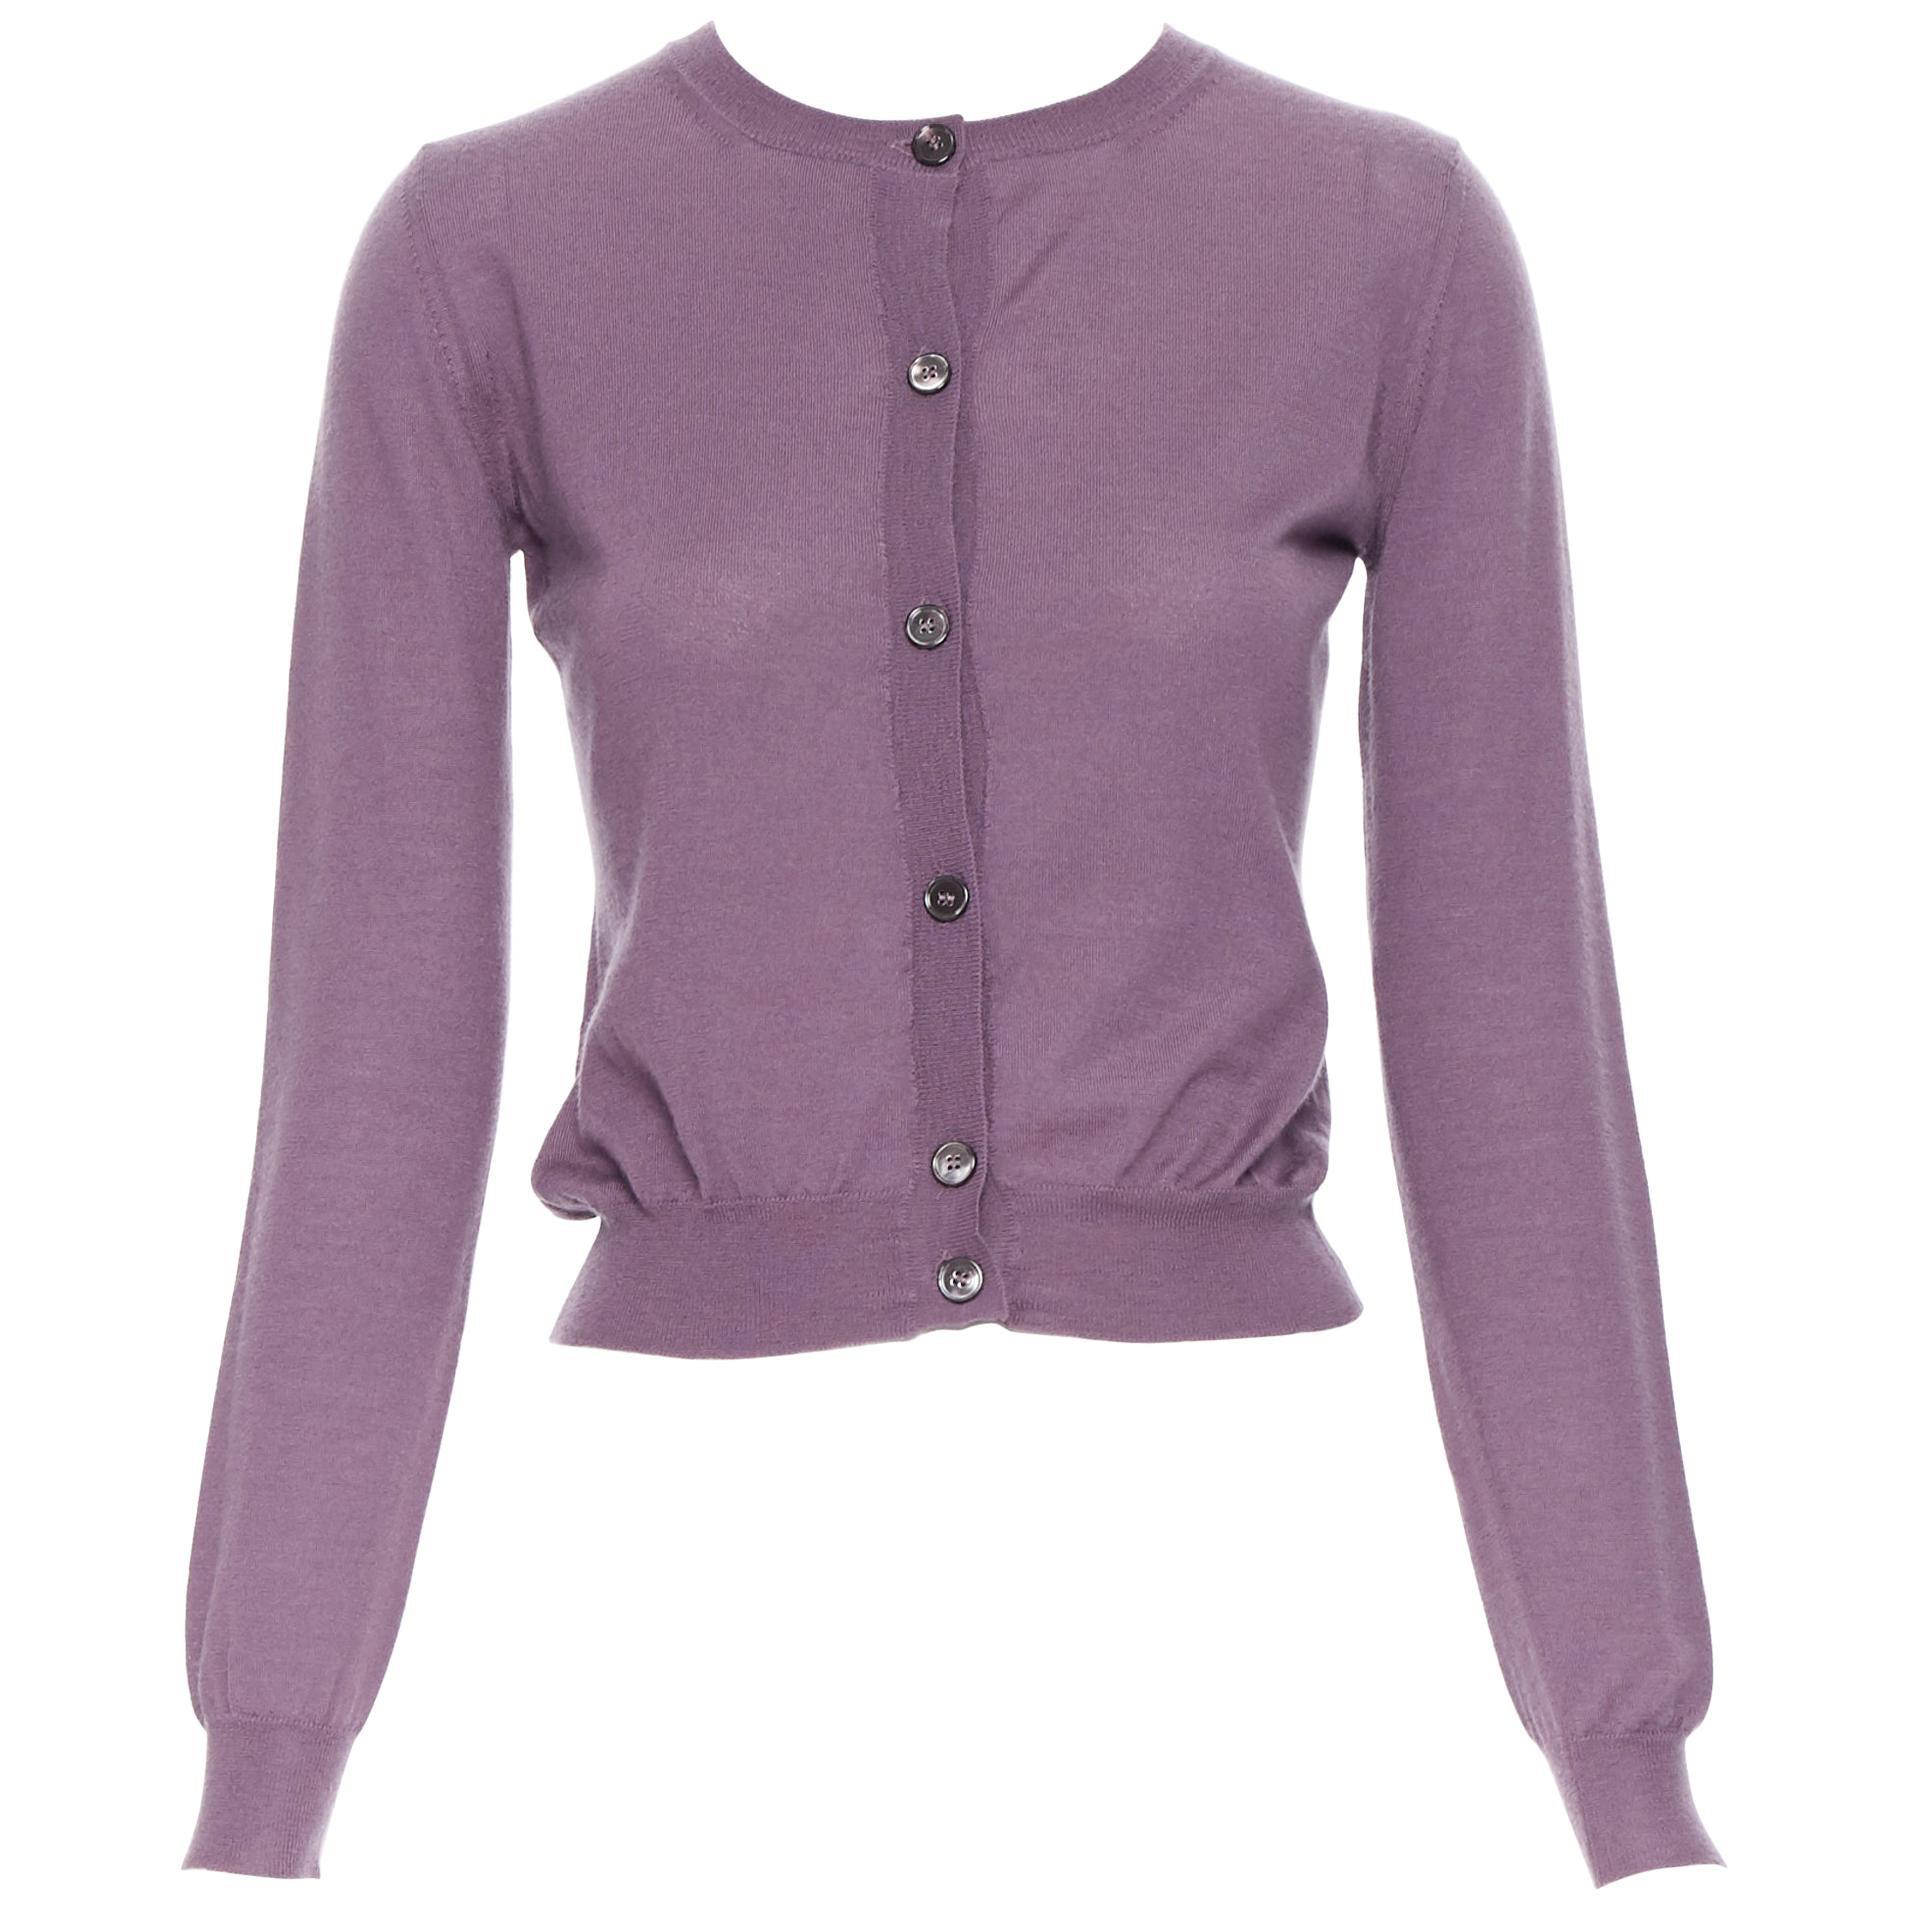 MARNI 100% cashmere purple long sleeve button front cardigan sweater IT38 XS